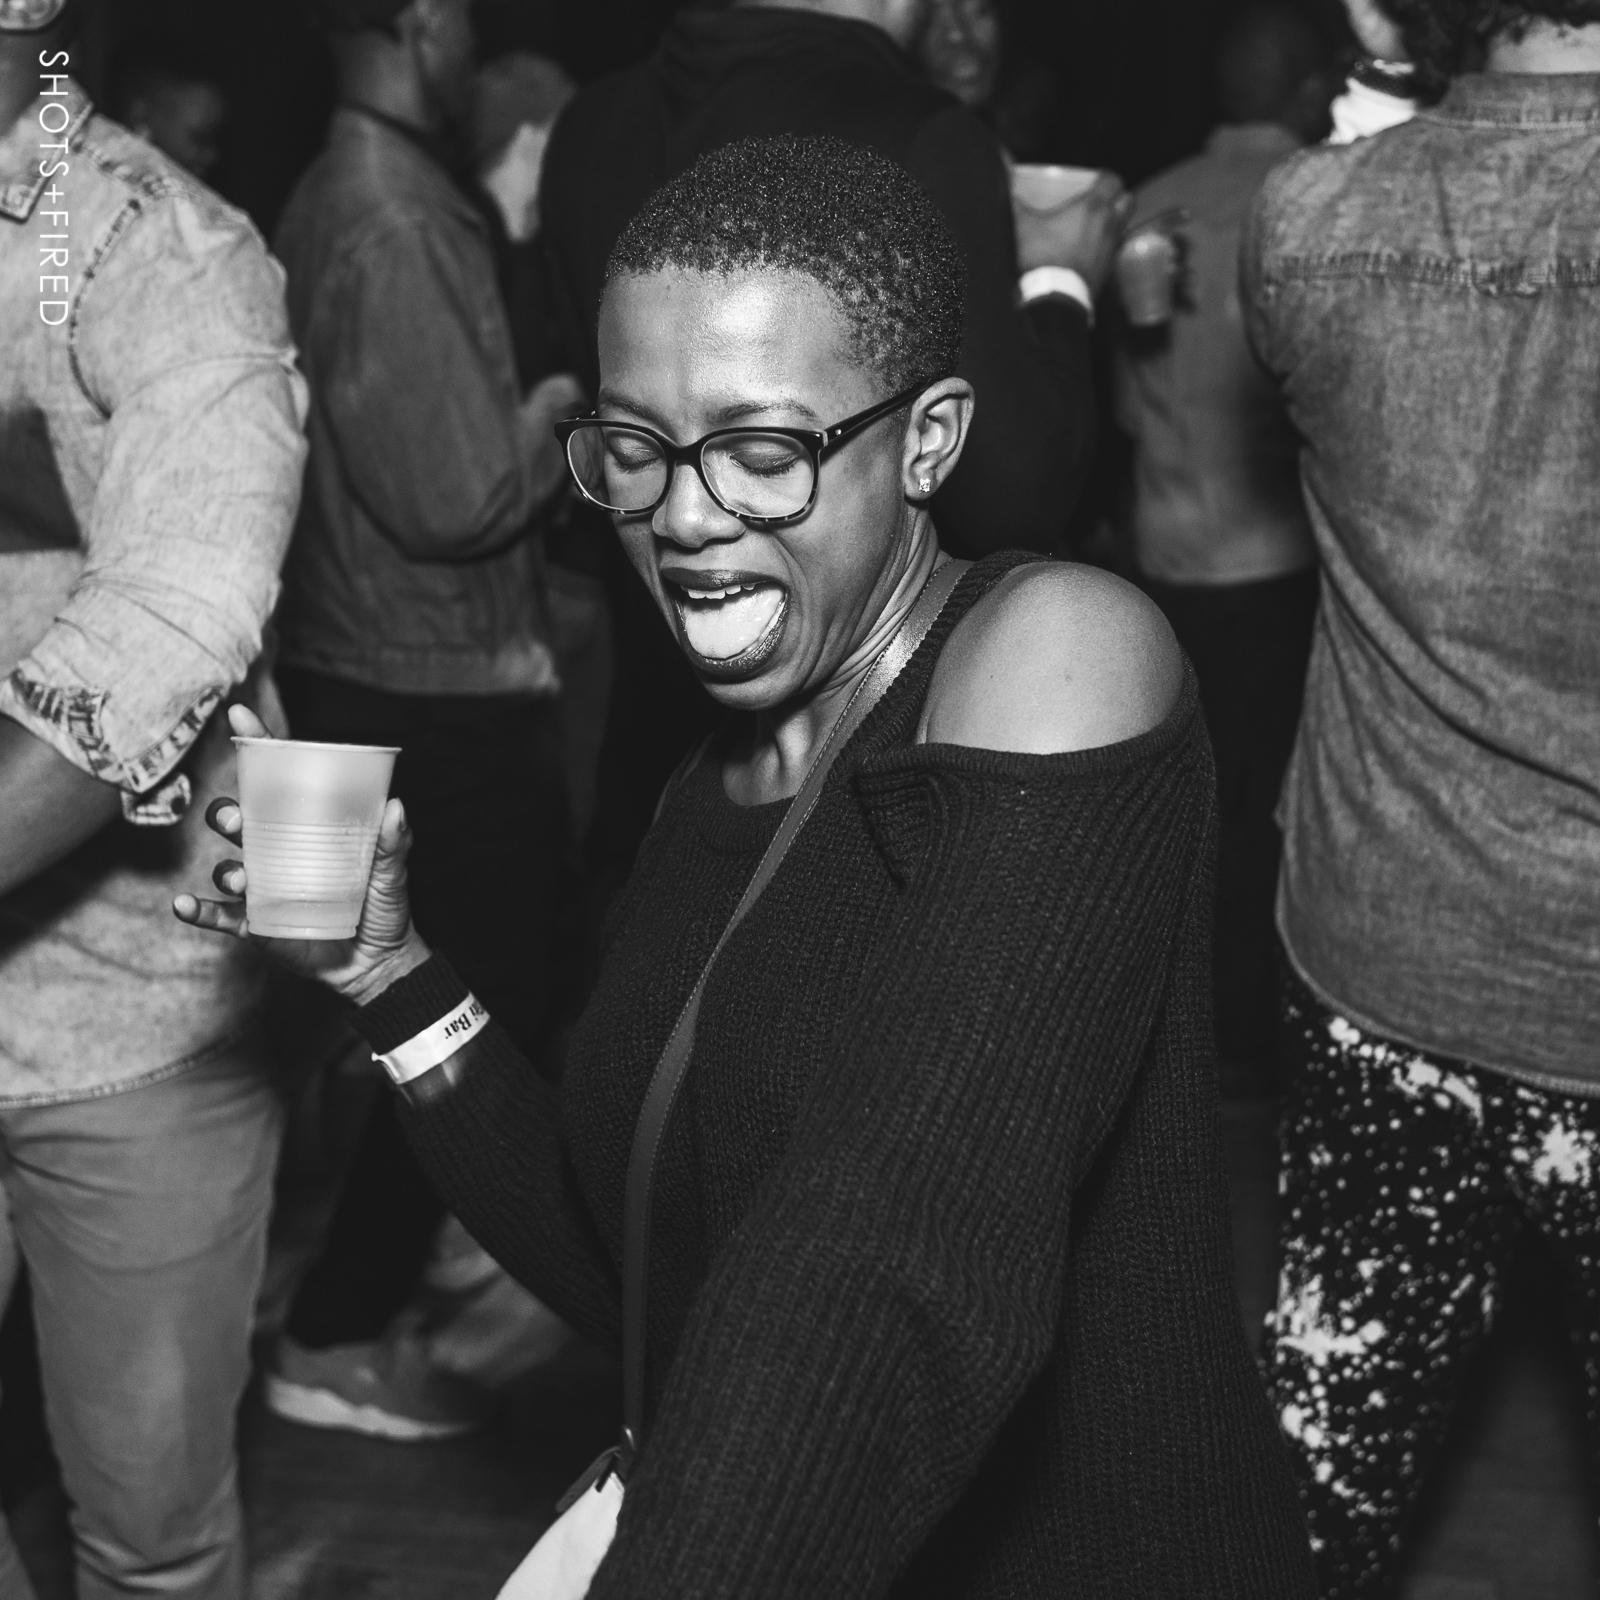 FRIENDS & FAM (PHL) W/ MATTHEW LAW Feat. SUGA SHAY @ WAREHOUSE ON WATTS (November 2018) // Presented By Matthew Law